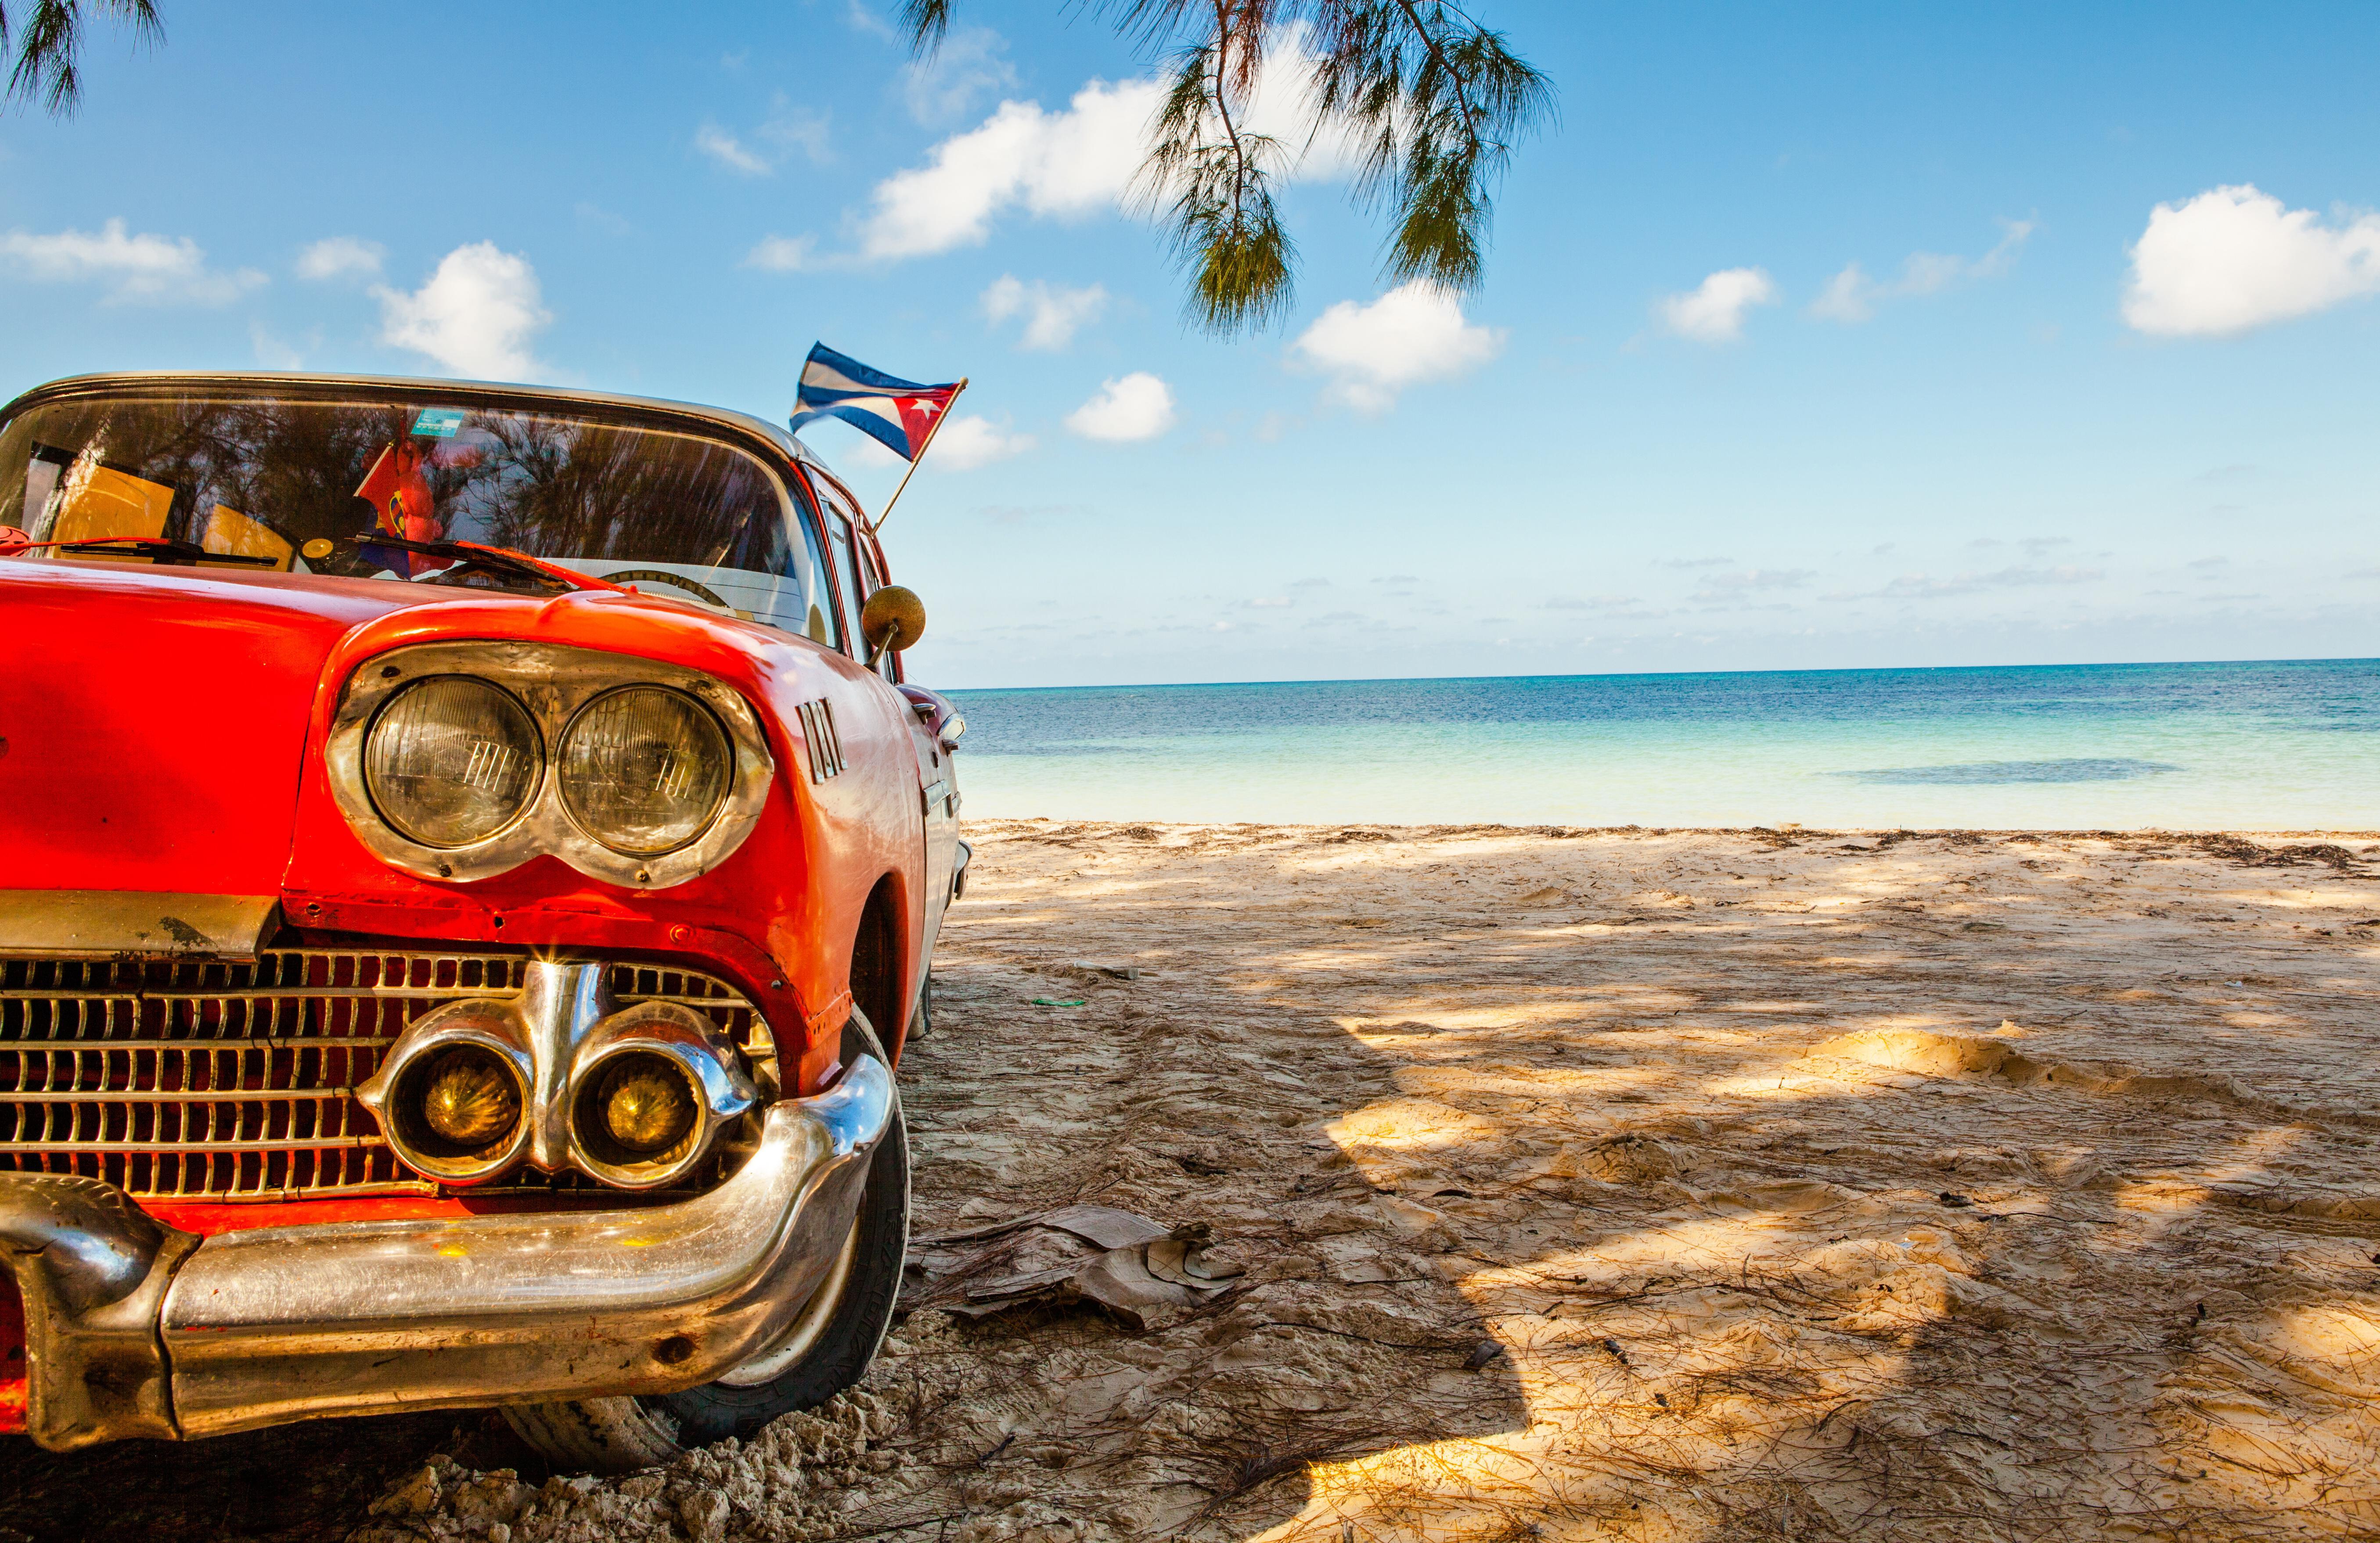 /optitravel/online/www/layout22/single_product.php?pkt_id=355&Produto=O Melhor de Cuba & Varadero&destino=CUBA